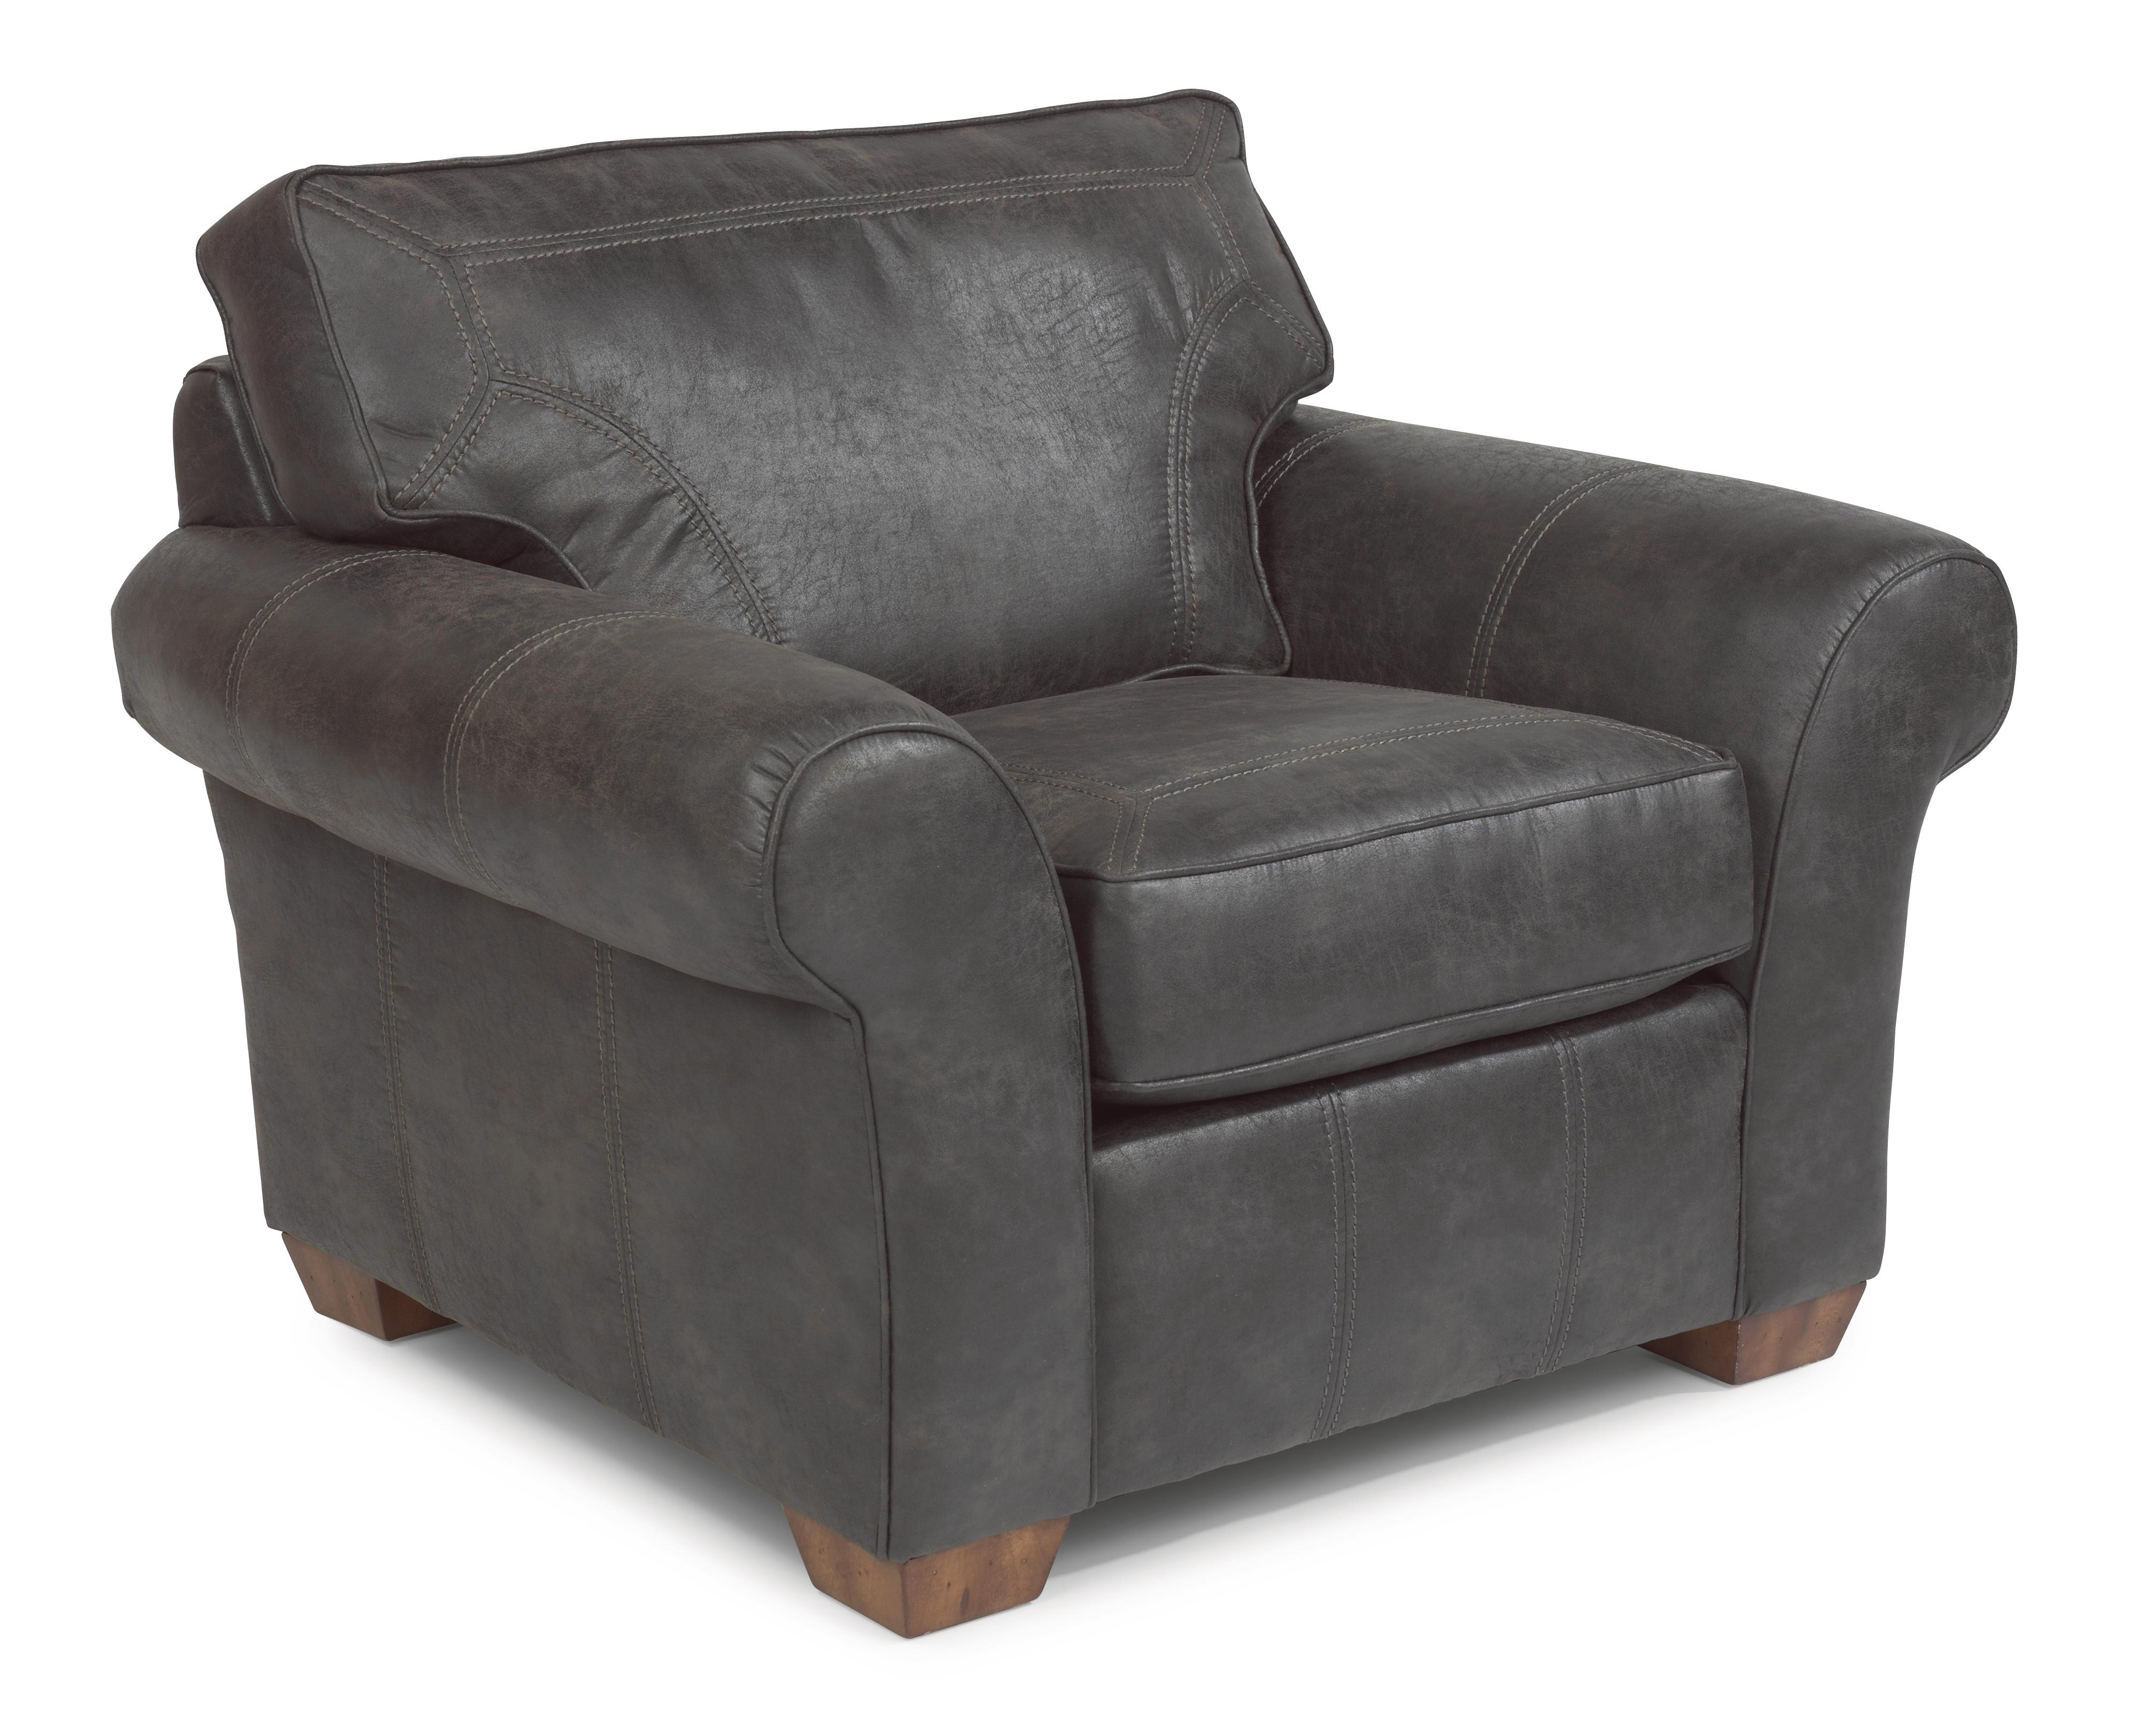 Flexsteel Vail N7305 10 Vail Upholstered Chair Dunk